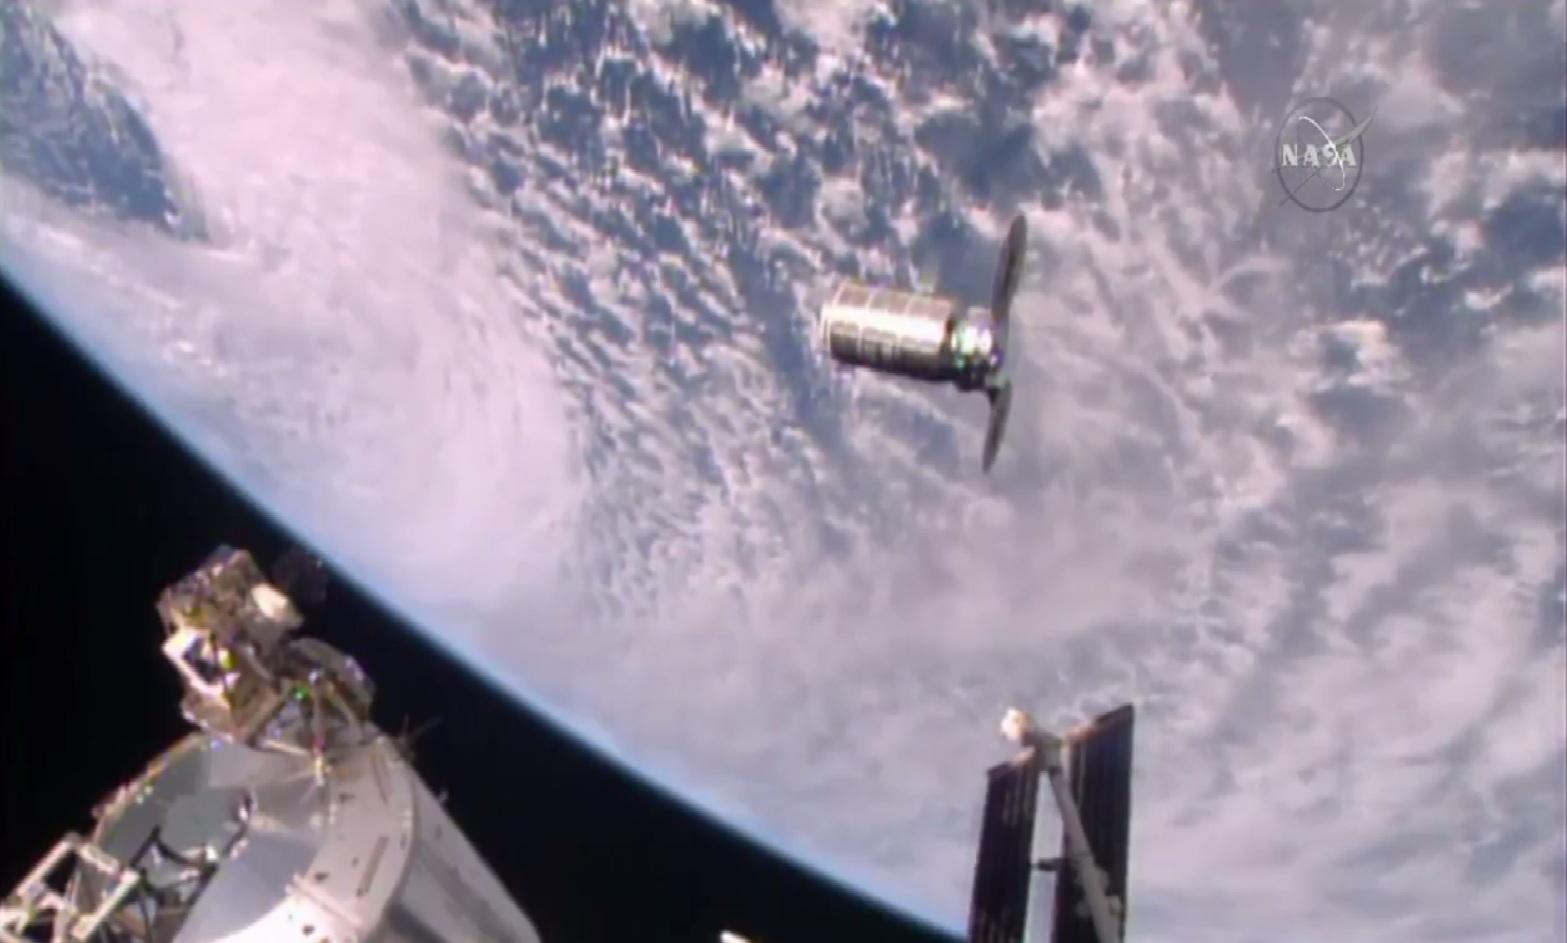 Orbital ATK Cygnus Supply Ship Arrives at Space Station